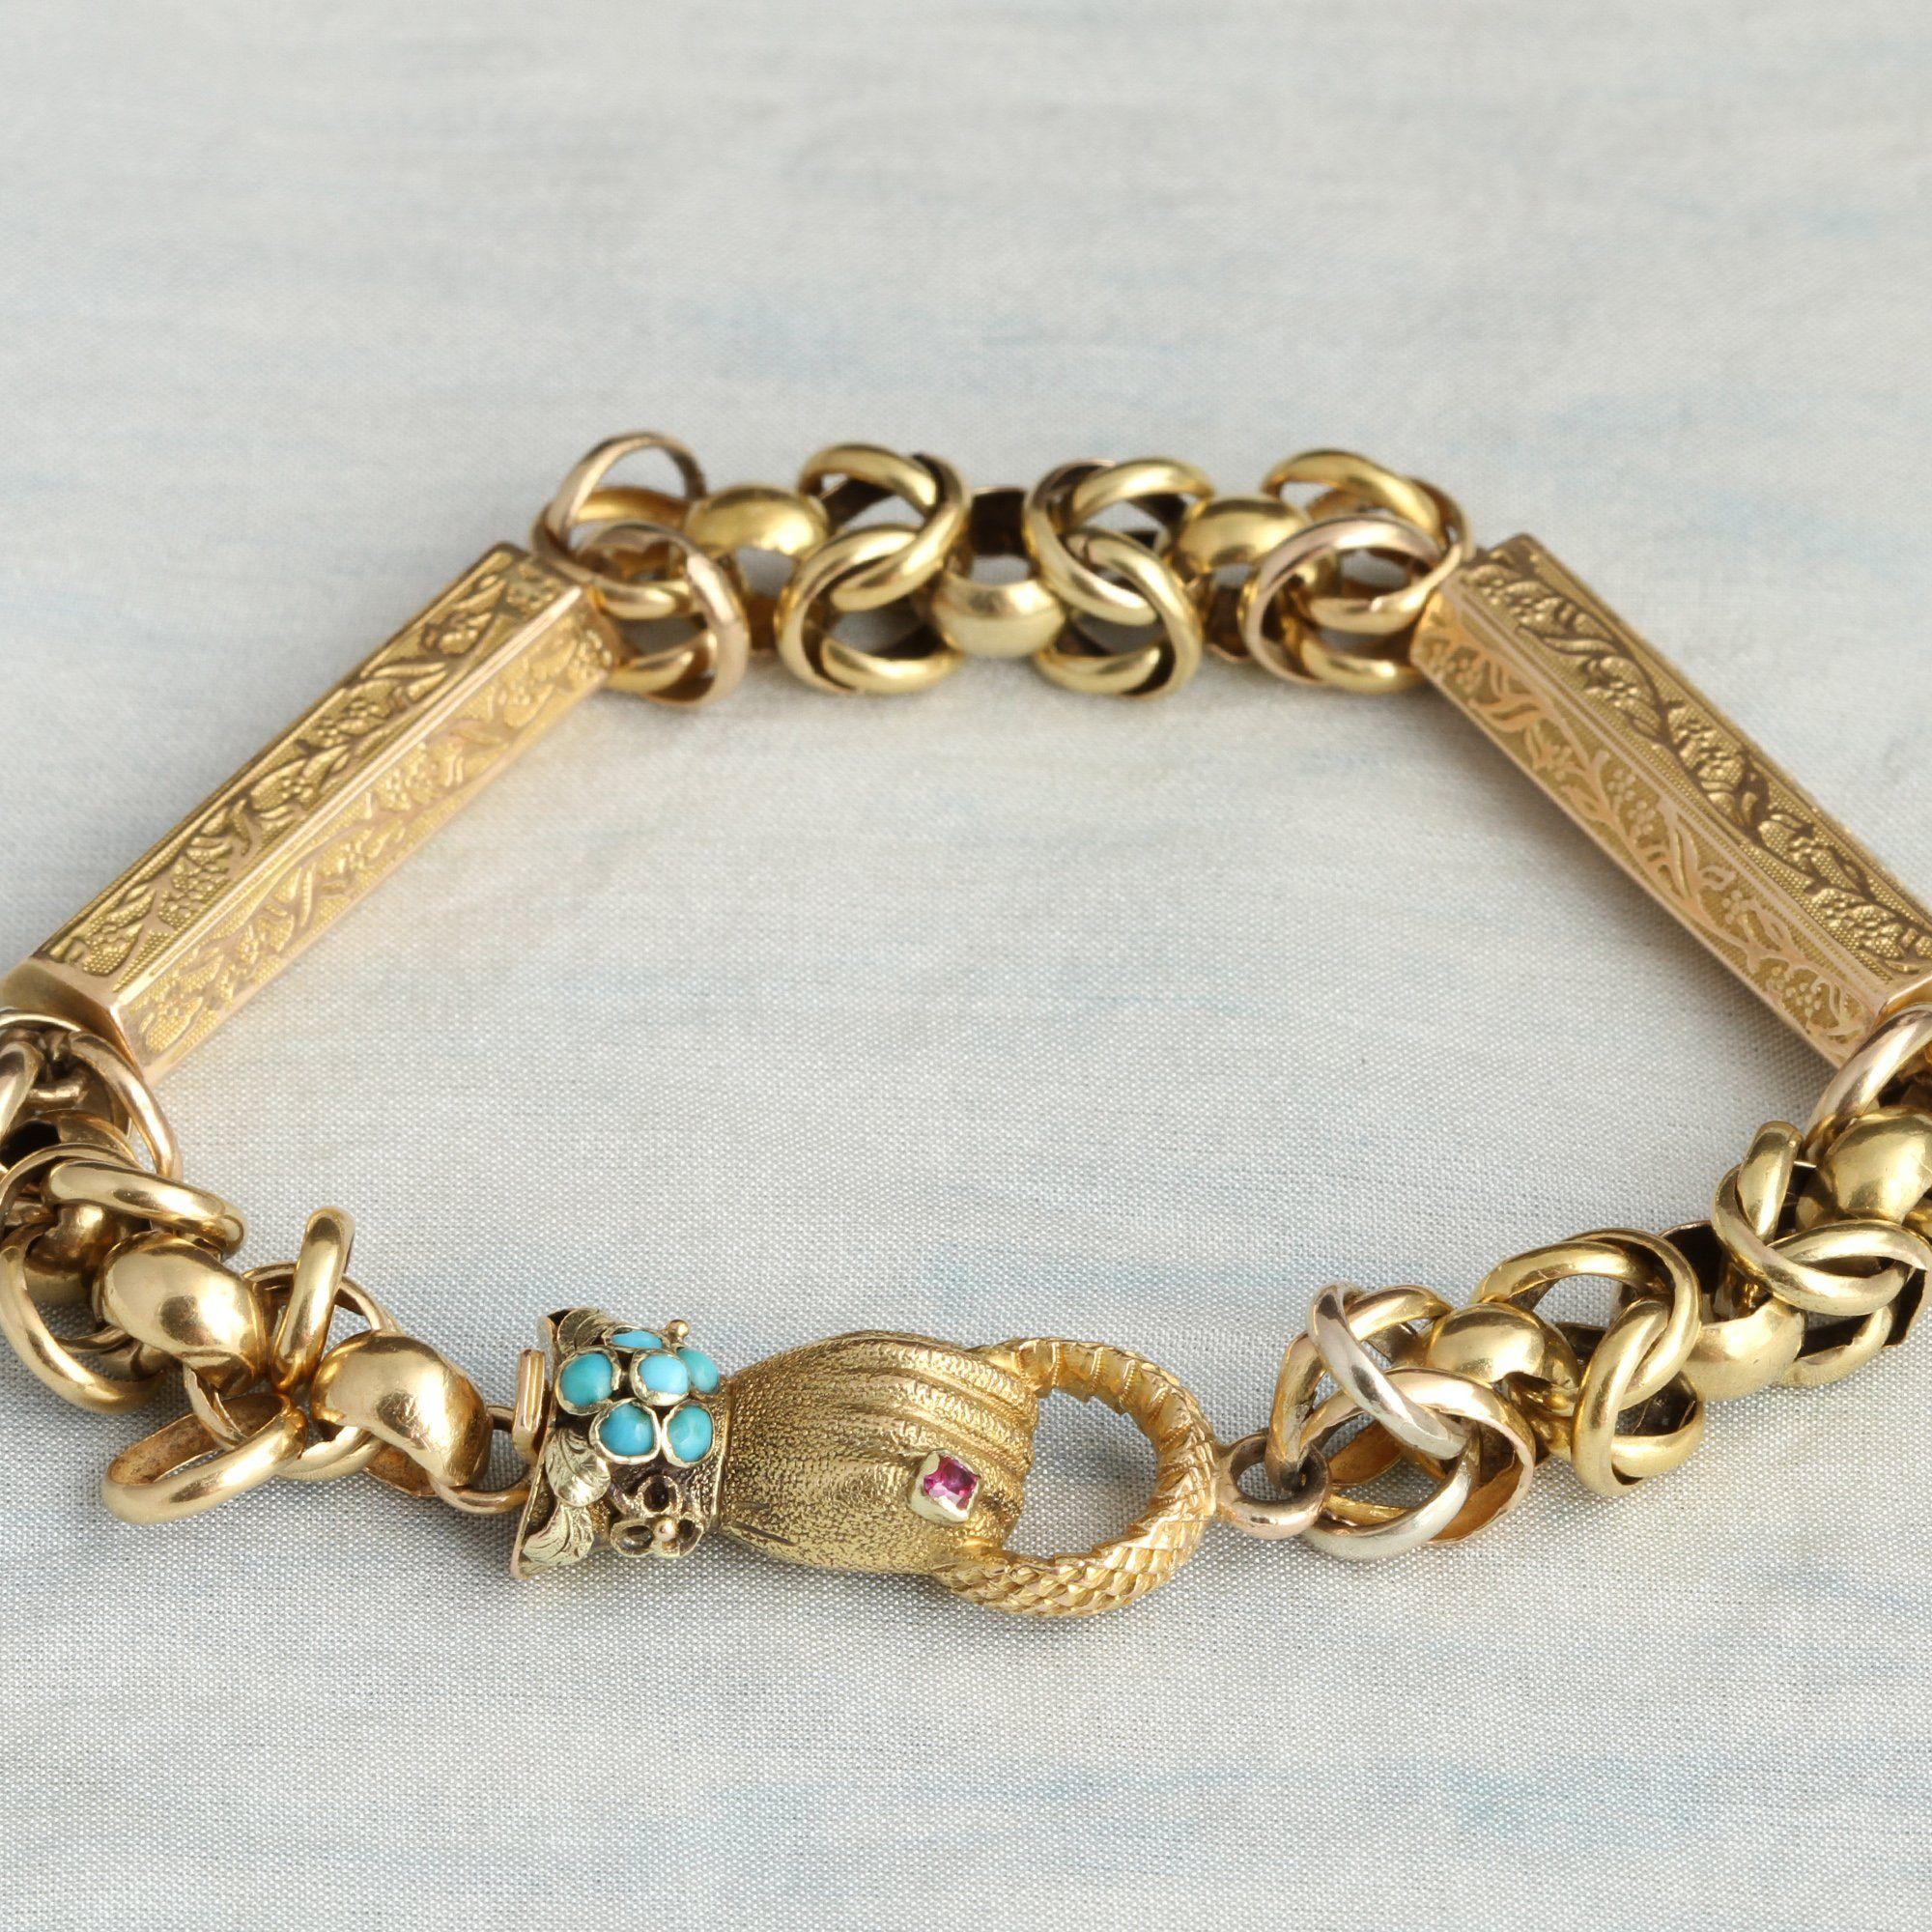 Georgian Pinchbeck Fancy Chain Hand Clasp Bracelet